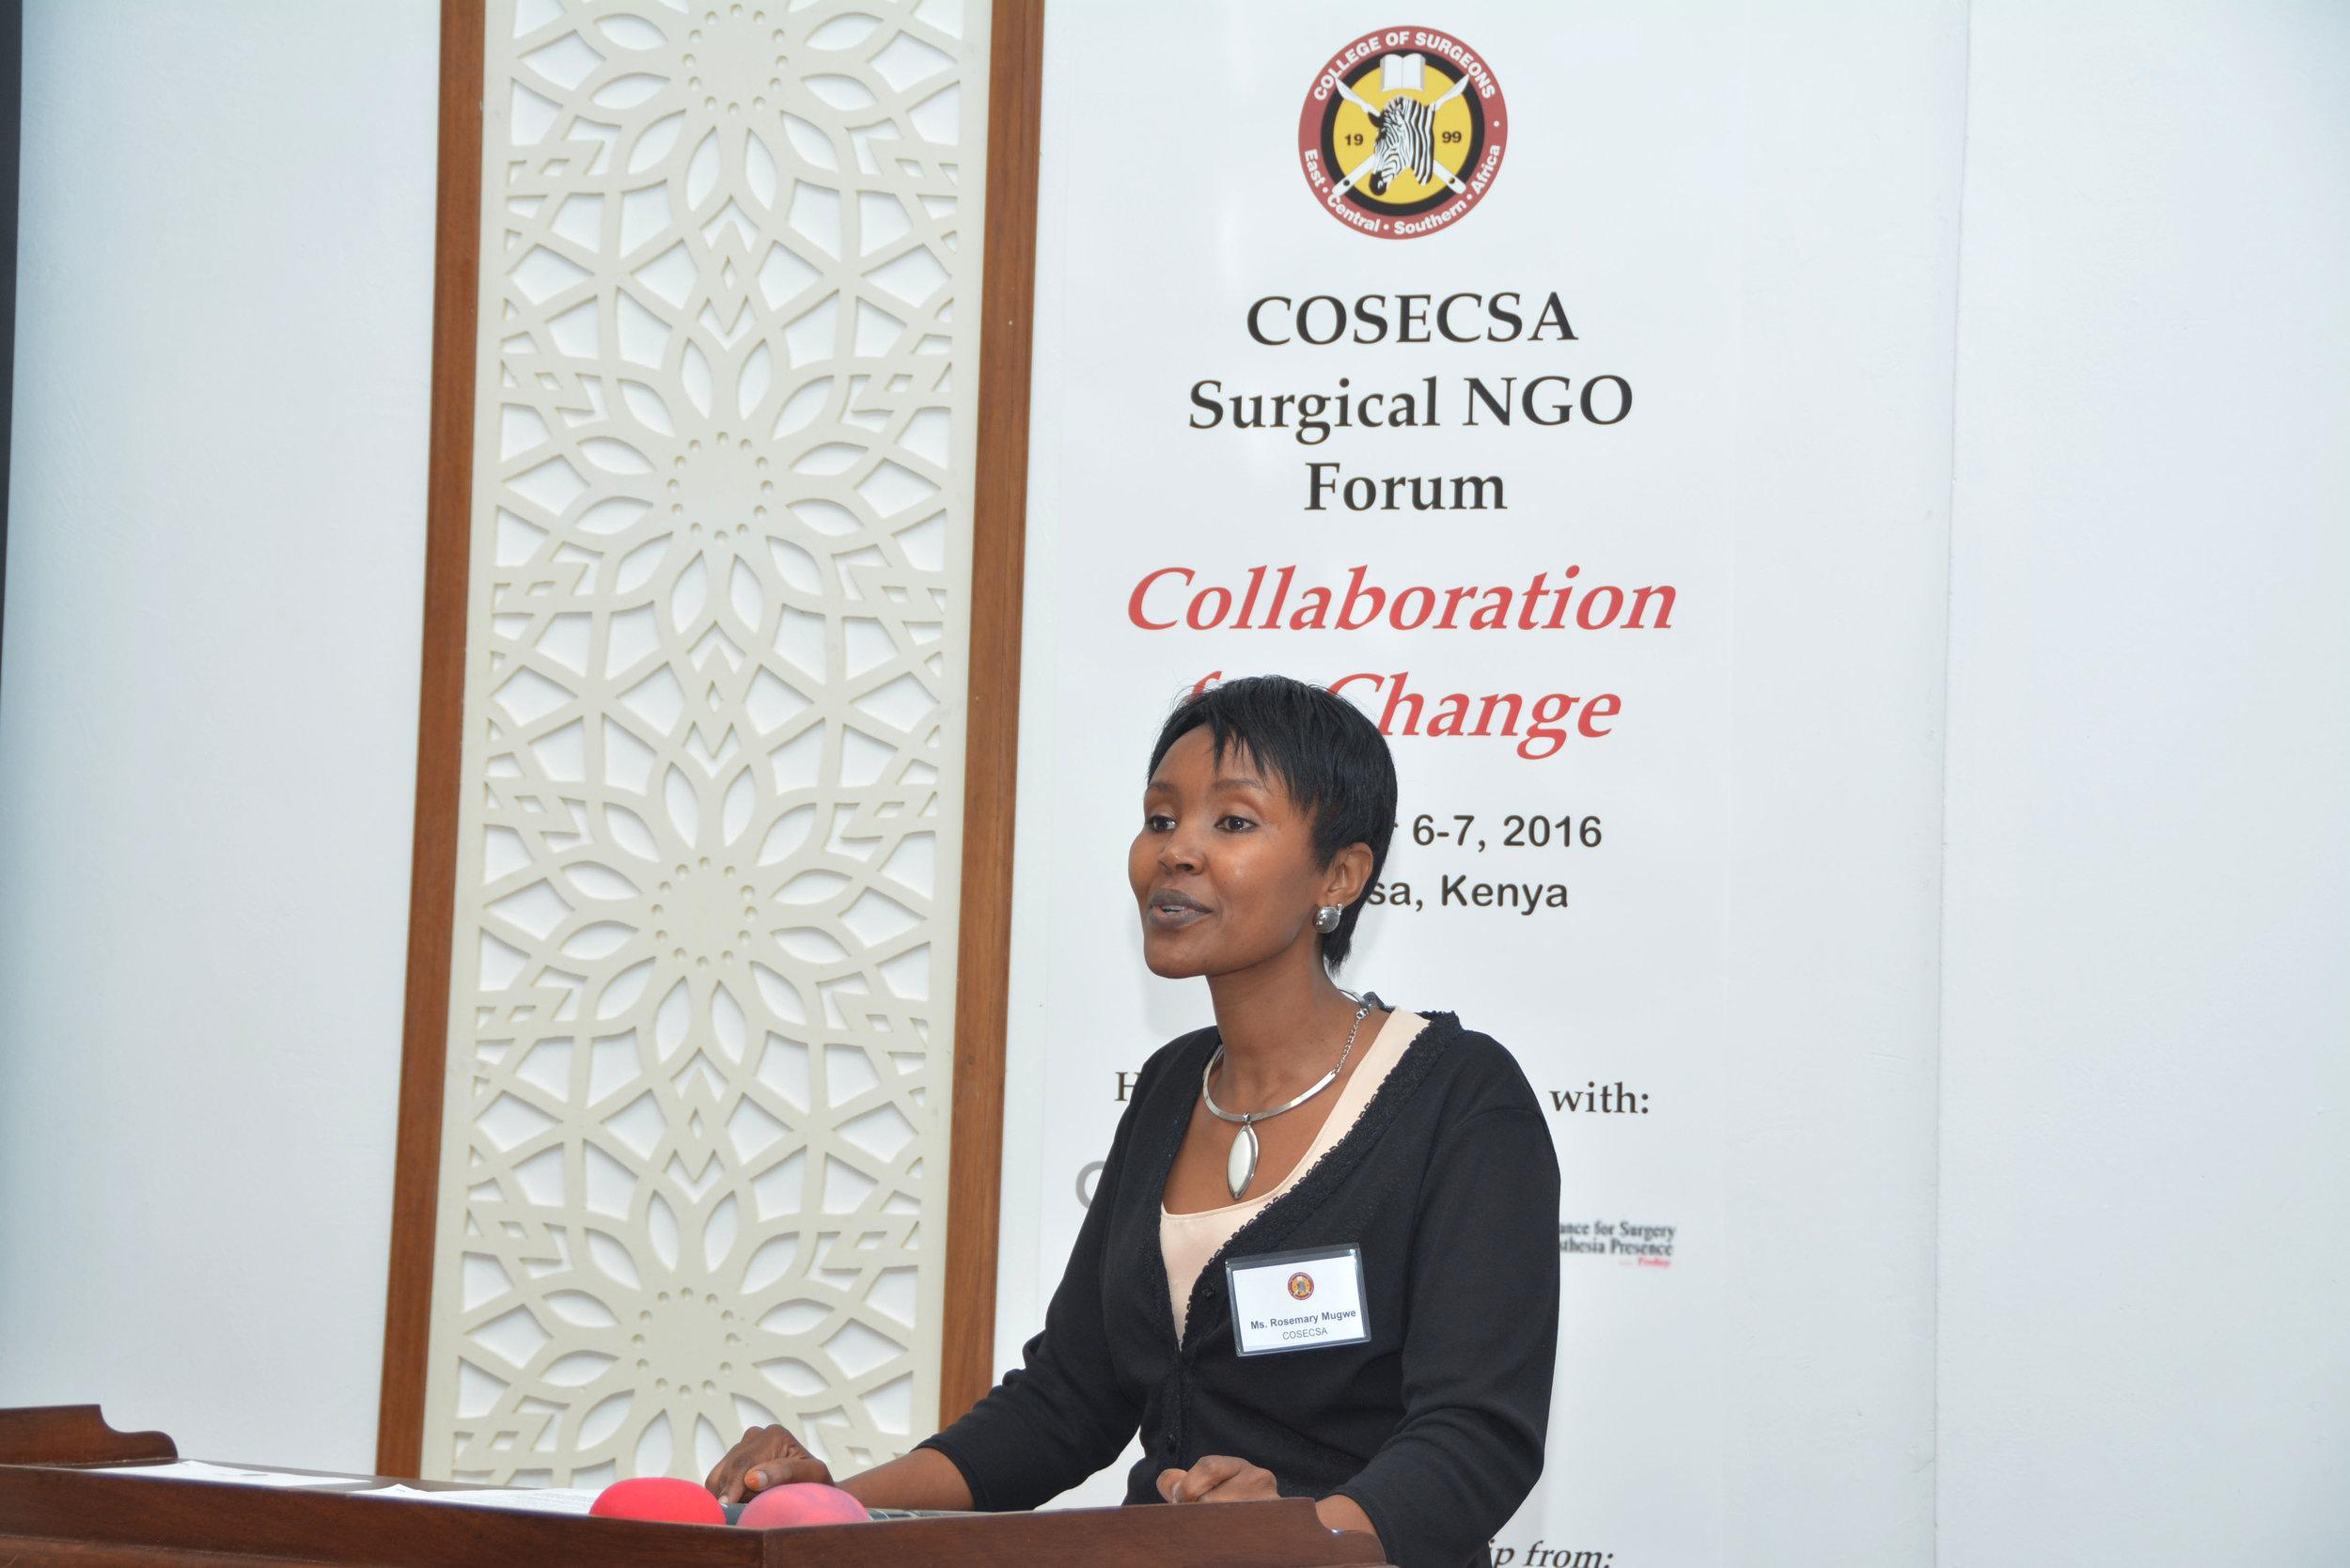 COSECSA Surgical NGO Forum - Ms. Rosemary Mugwe - CEO, COSECSA (2).JPG